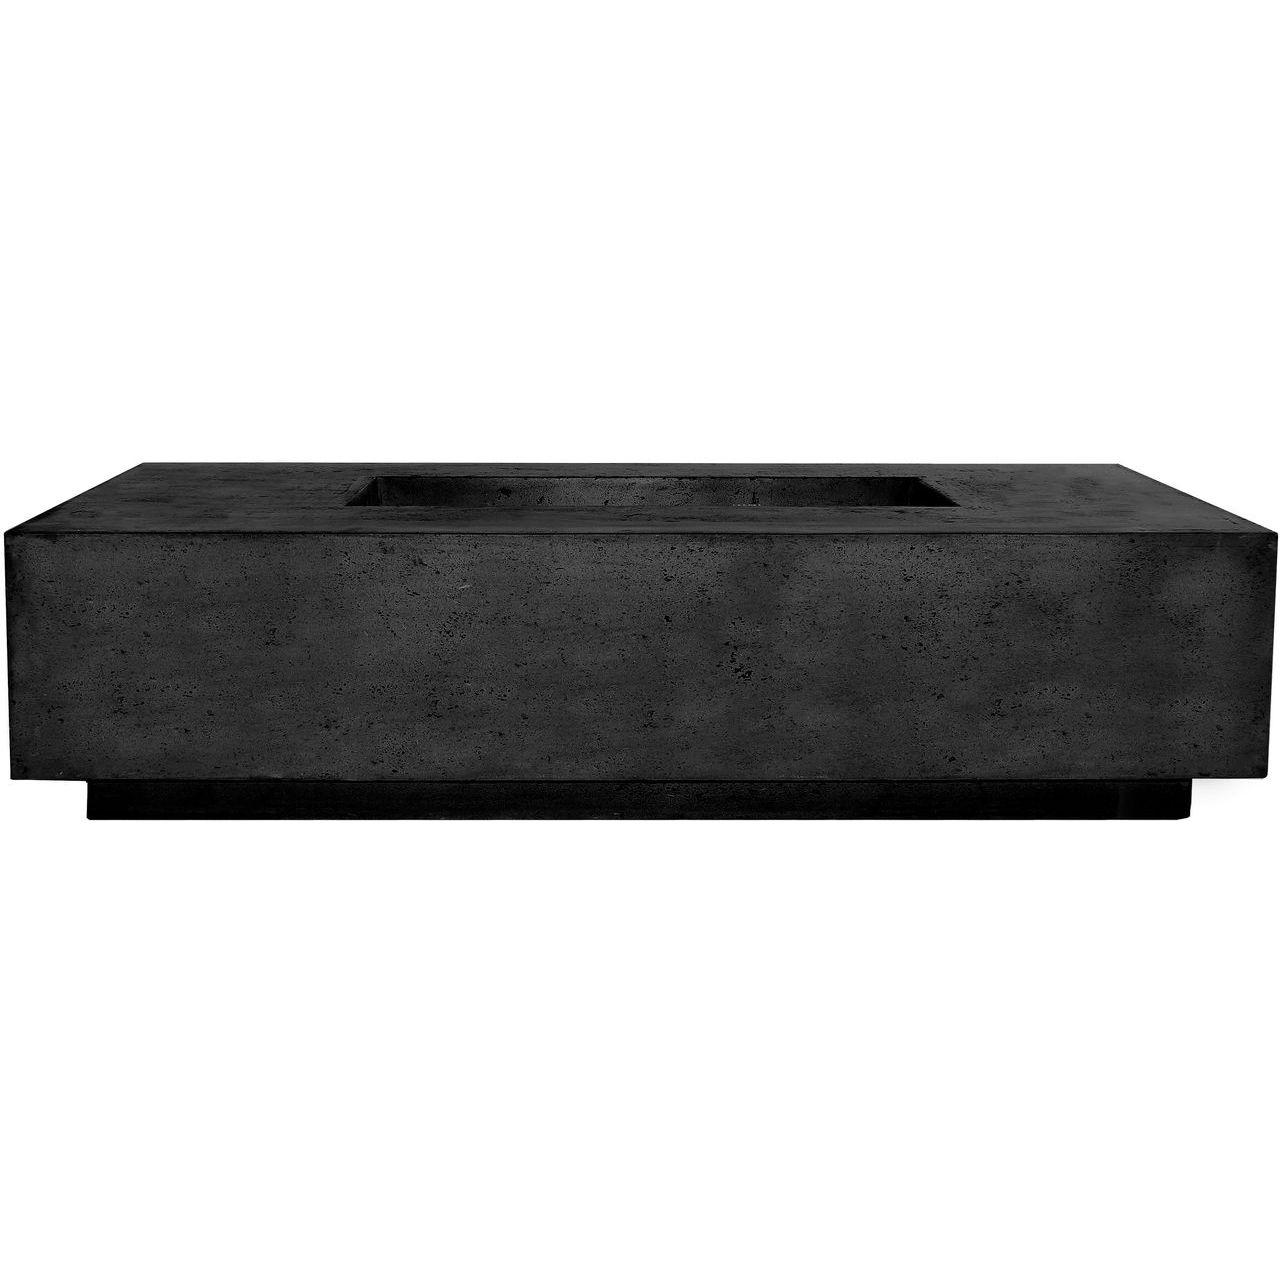 Prism Hardscapes Tavola 8 Fire Table in Ebony - LP